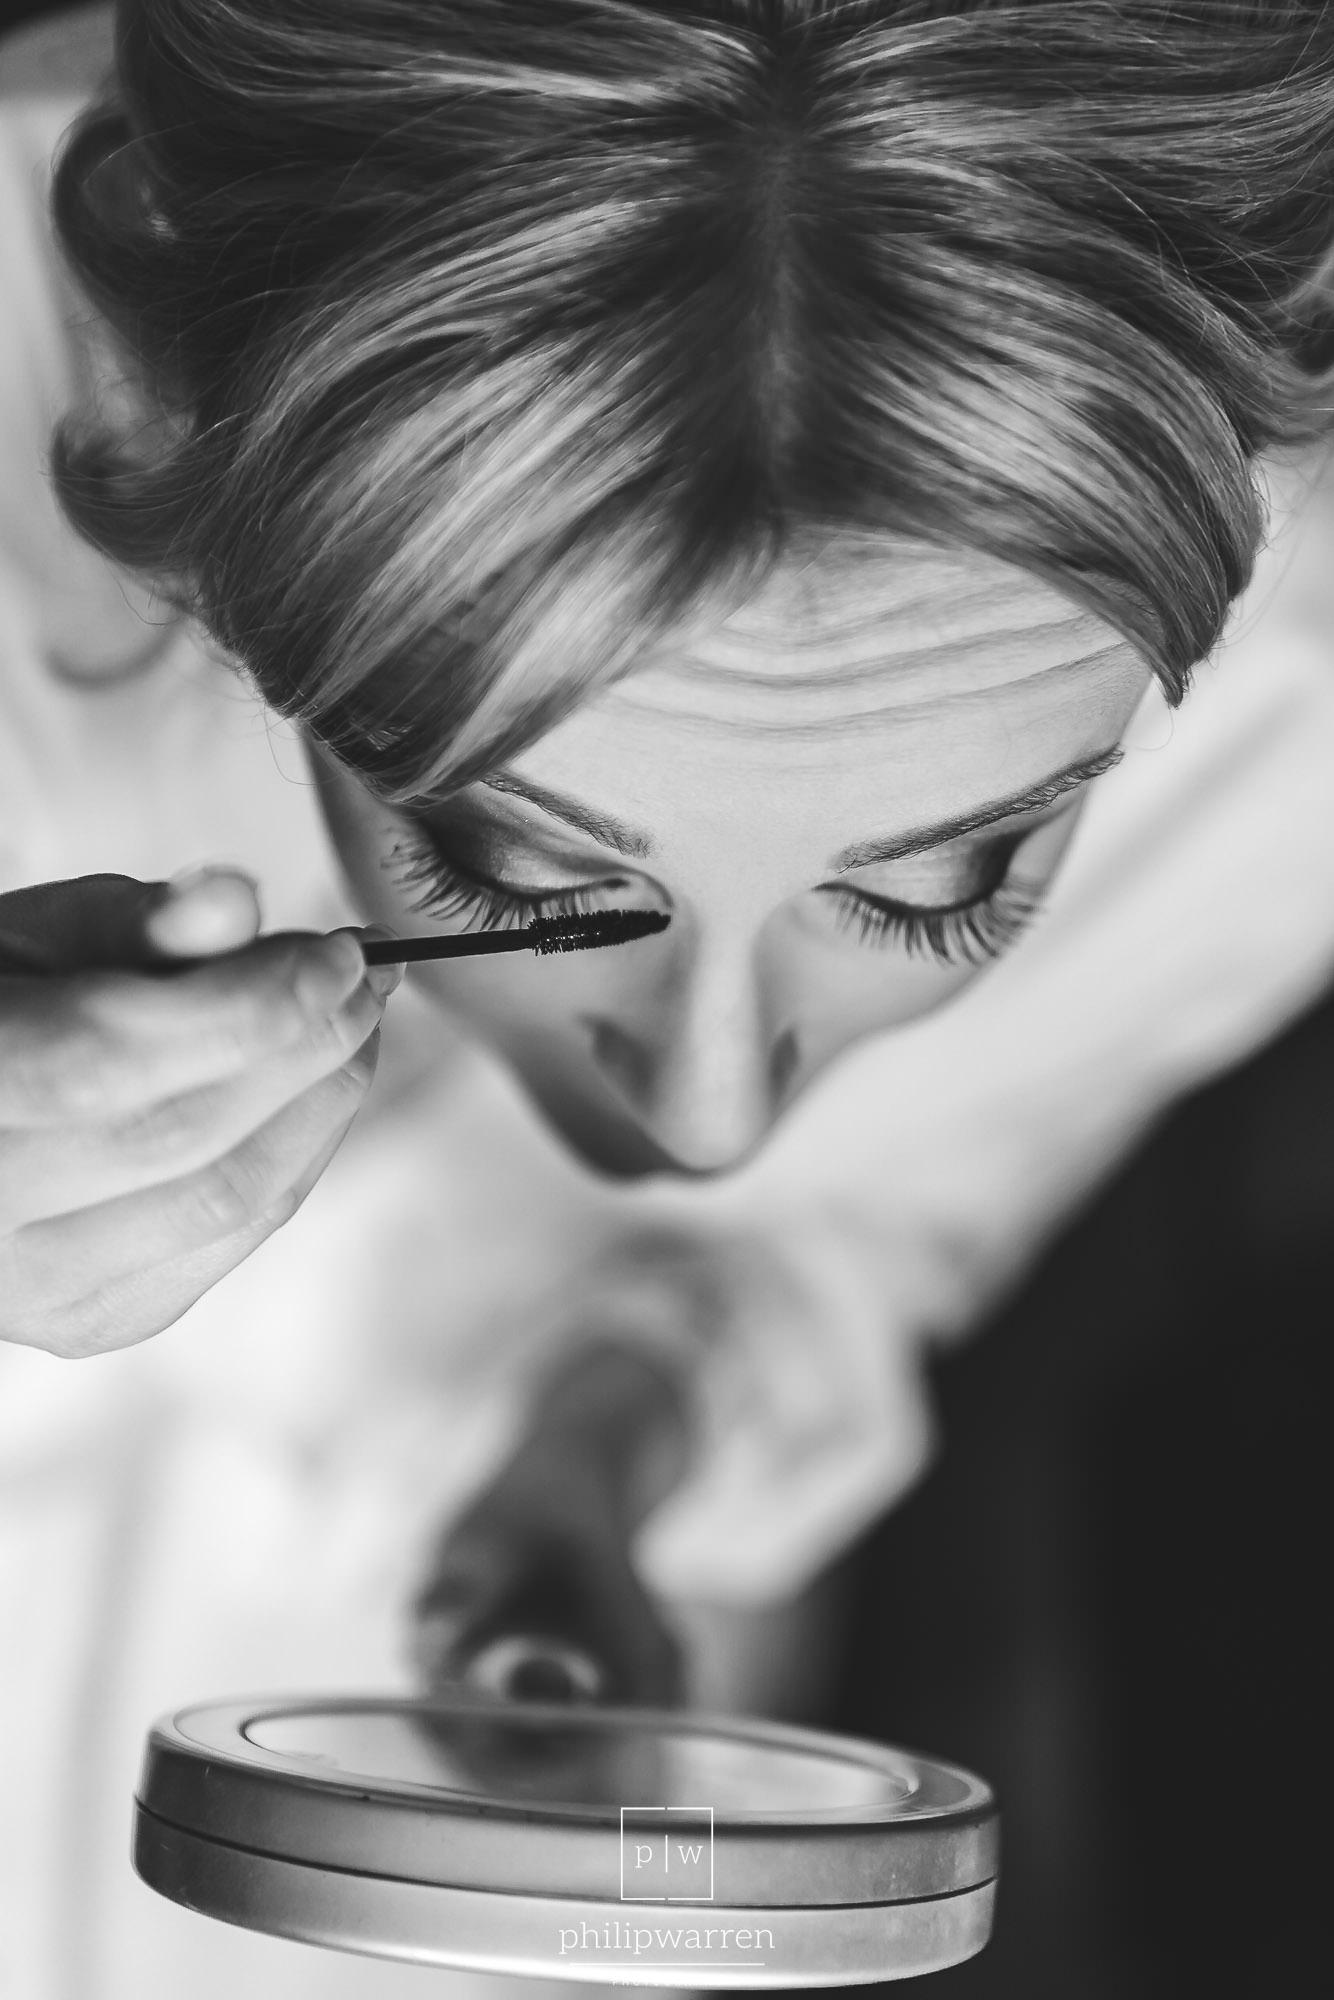 bride doing makeup in mirror taken from above